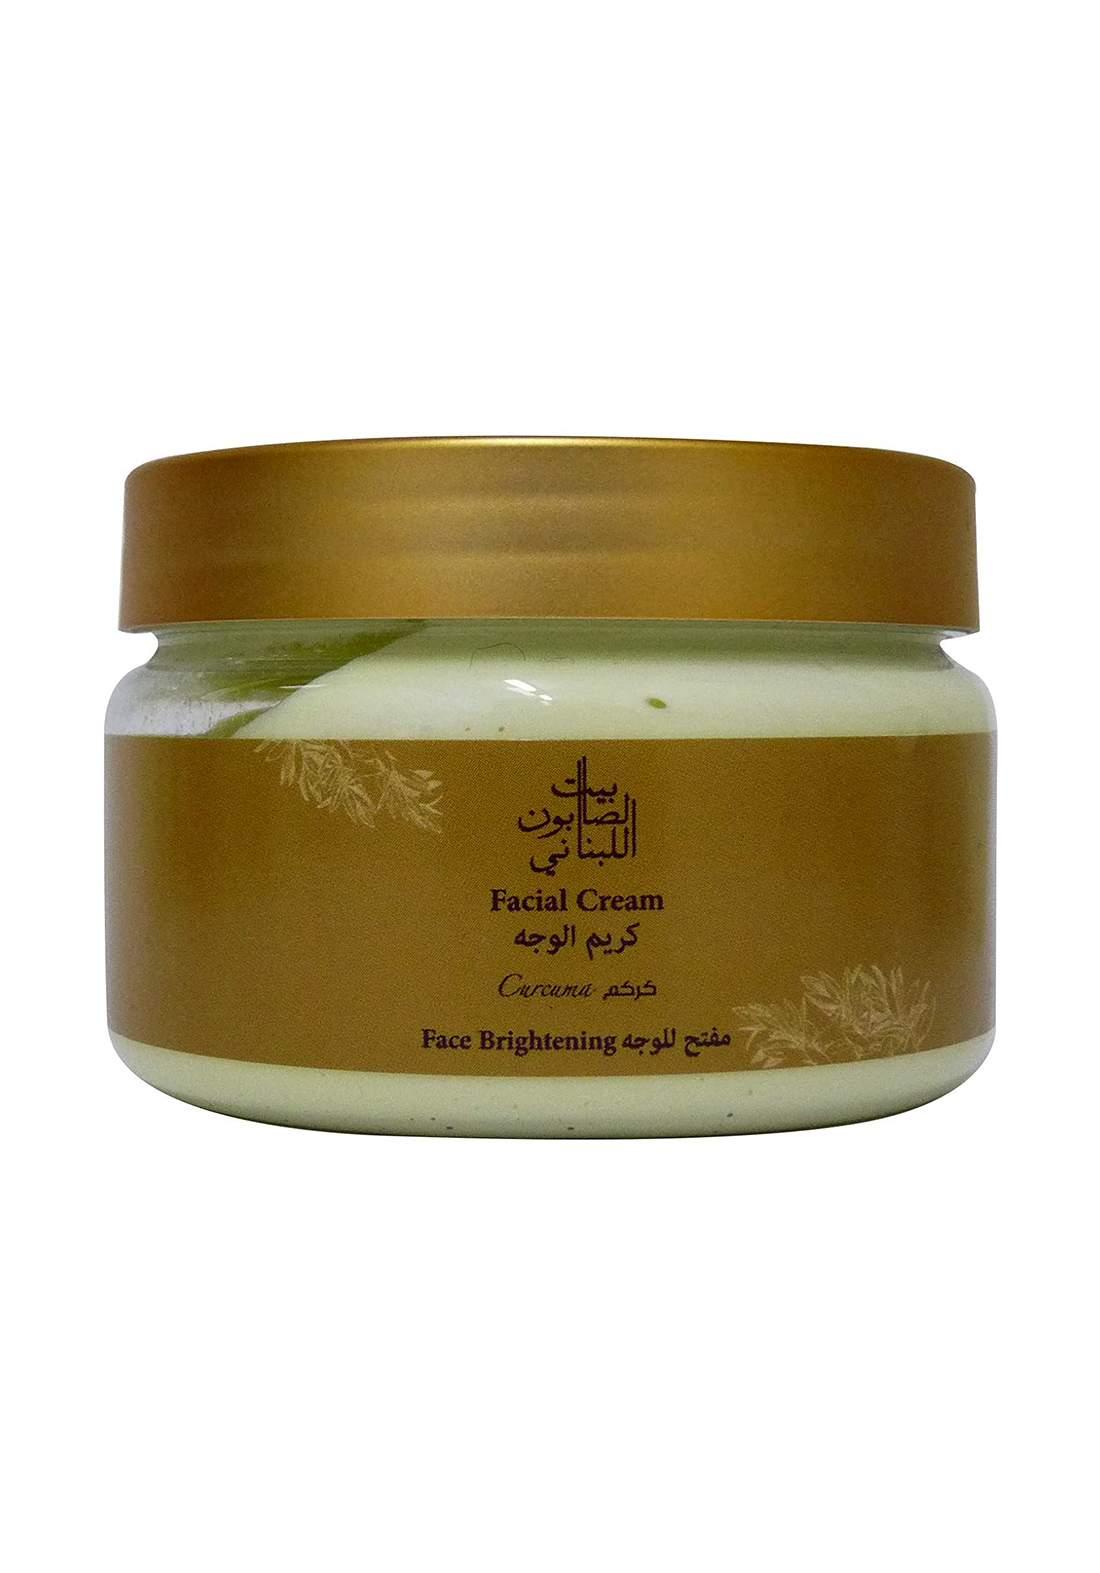 Bayt Alsaboun Alloubnani-317497 Facial Cream Curcuma 150g كريم